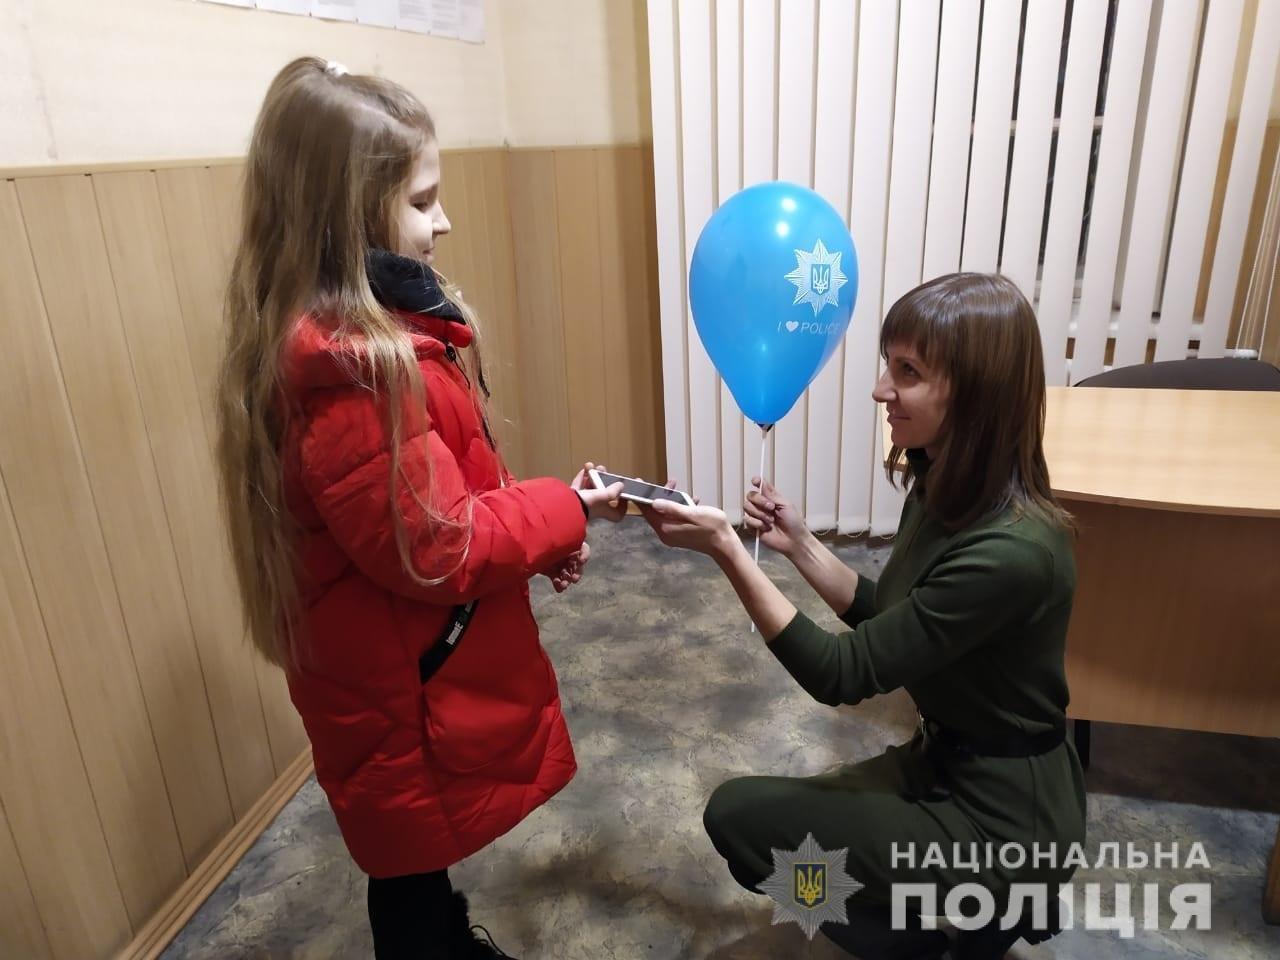 На Днепропетровщине мужчина ограбил 8-летнюю школьницу, - ФОТО, фото-2